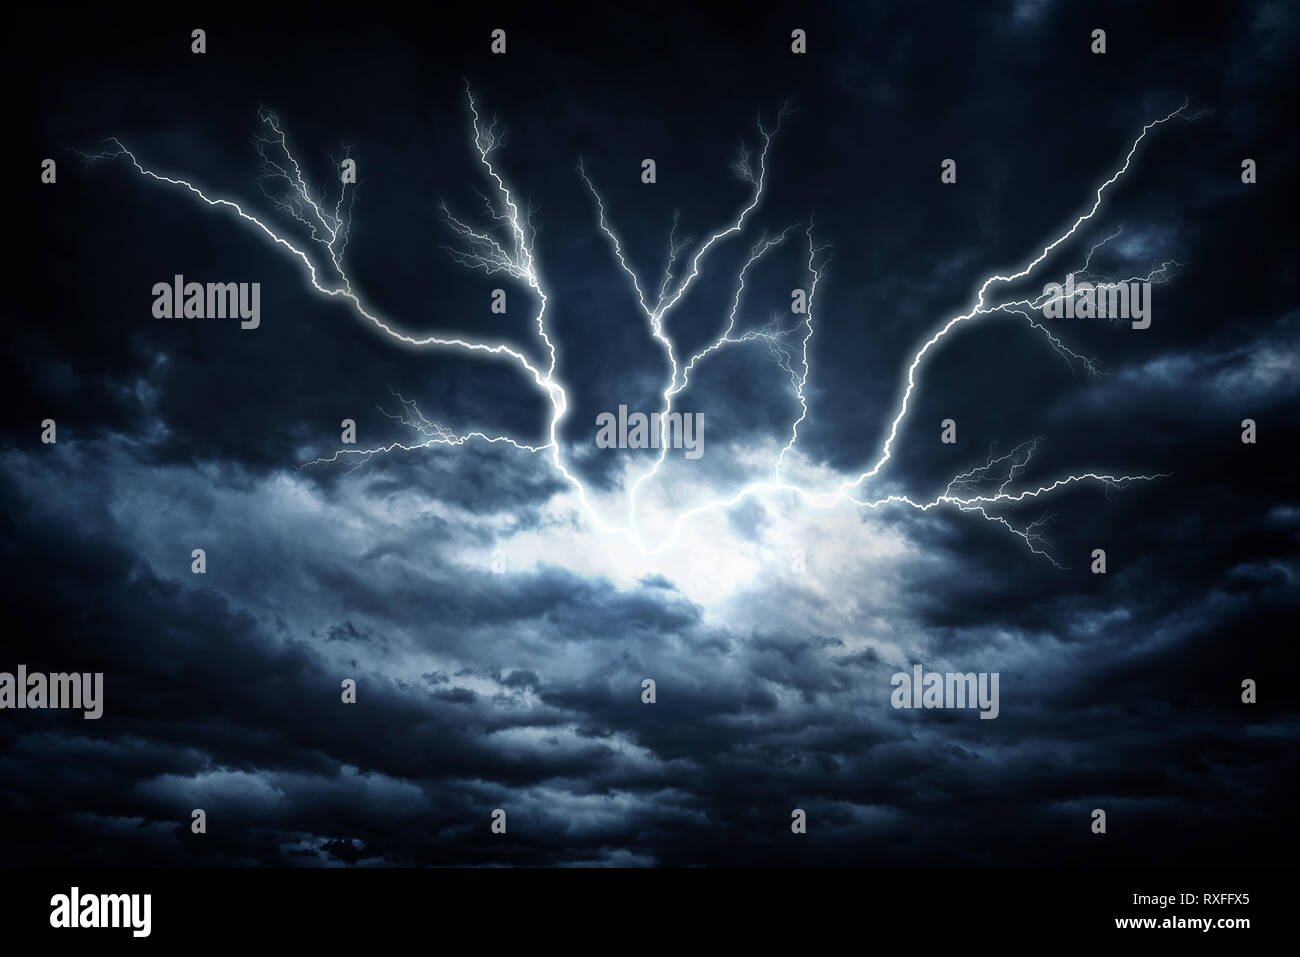 Lightning strike on the dark cloudy sky. Stock Photo